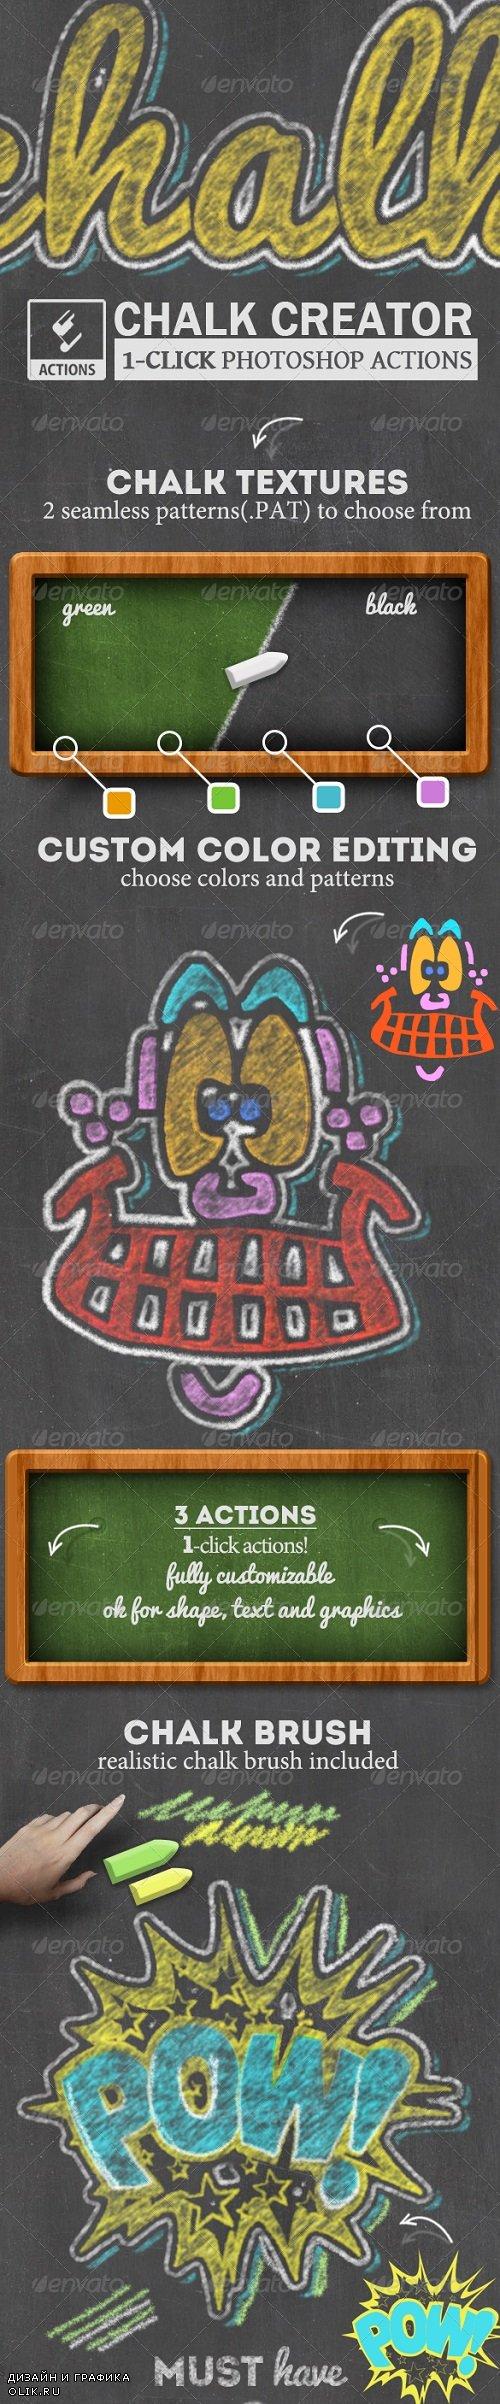 Chalk and Chalkboard PHSP Creator - 8174689